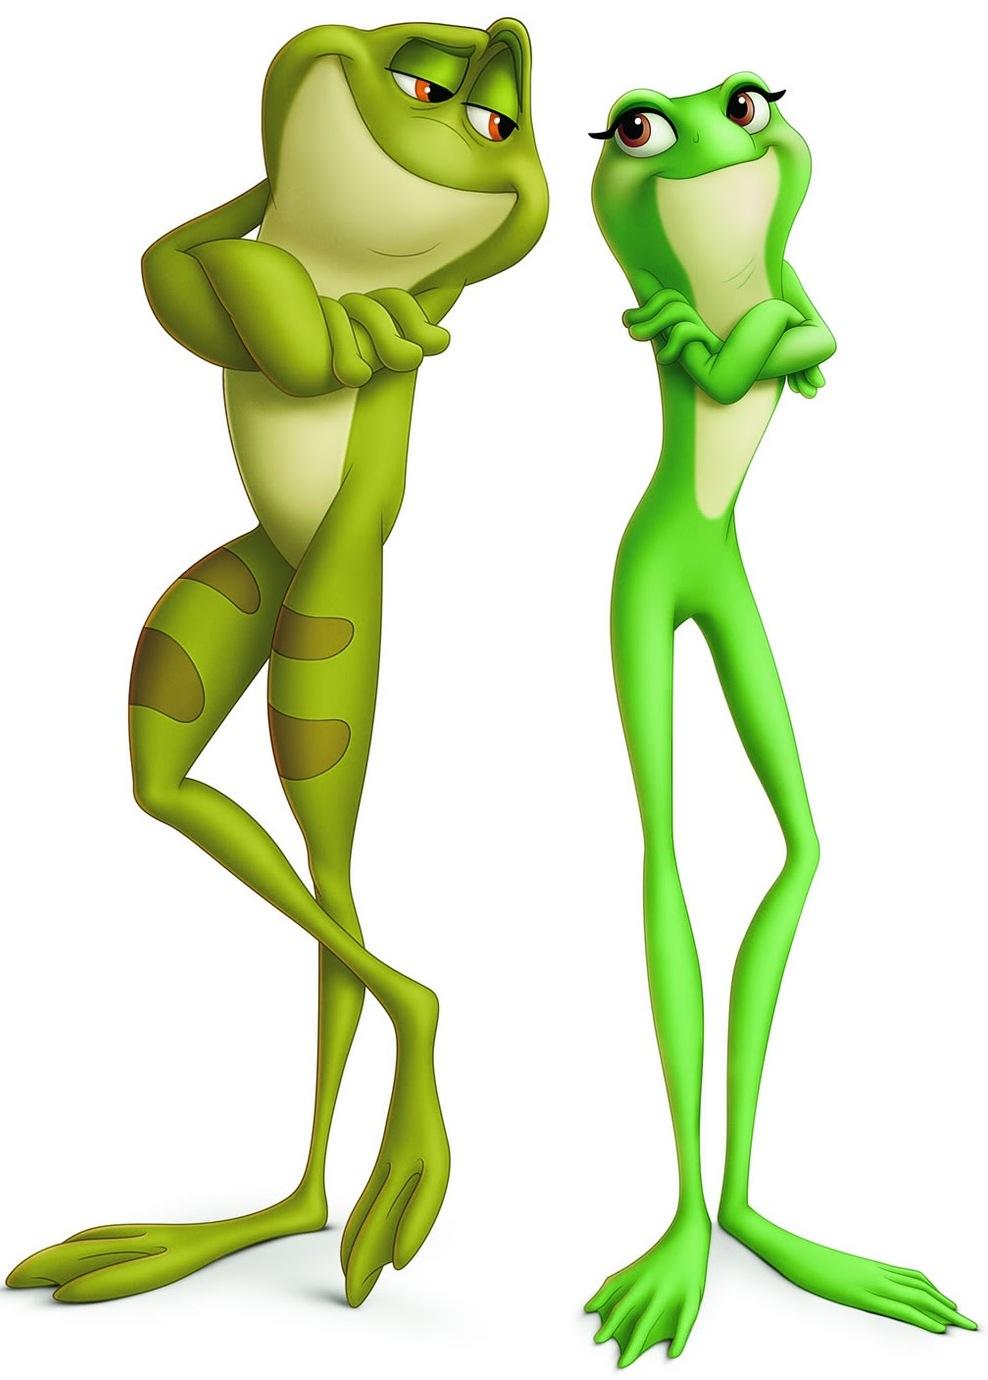 Http Encantosdalinda Blogspot Com Search Label A 20princesa 20e 20o 20sapo Disney Princess Tiana Tiana Disney Frog Pictures